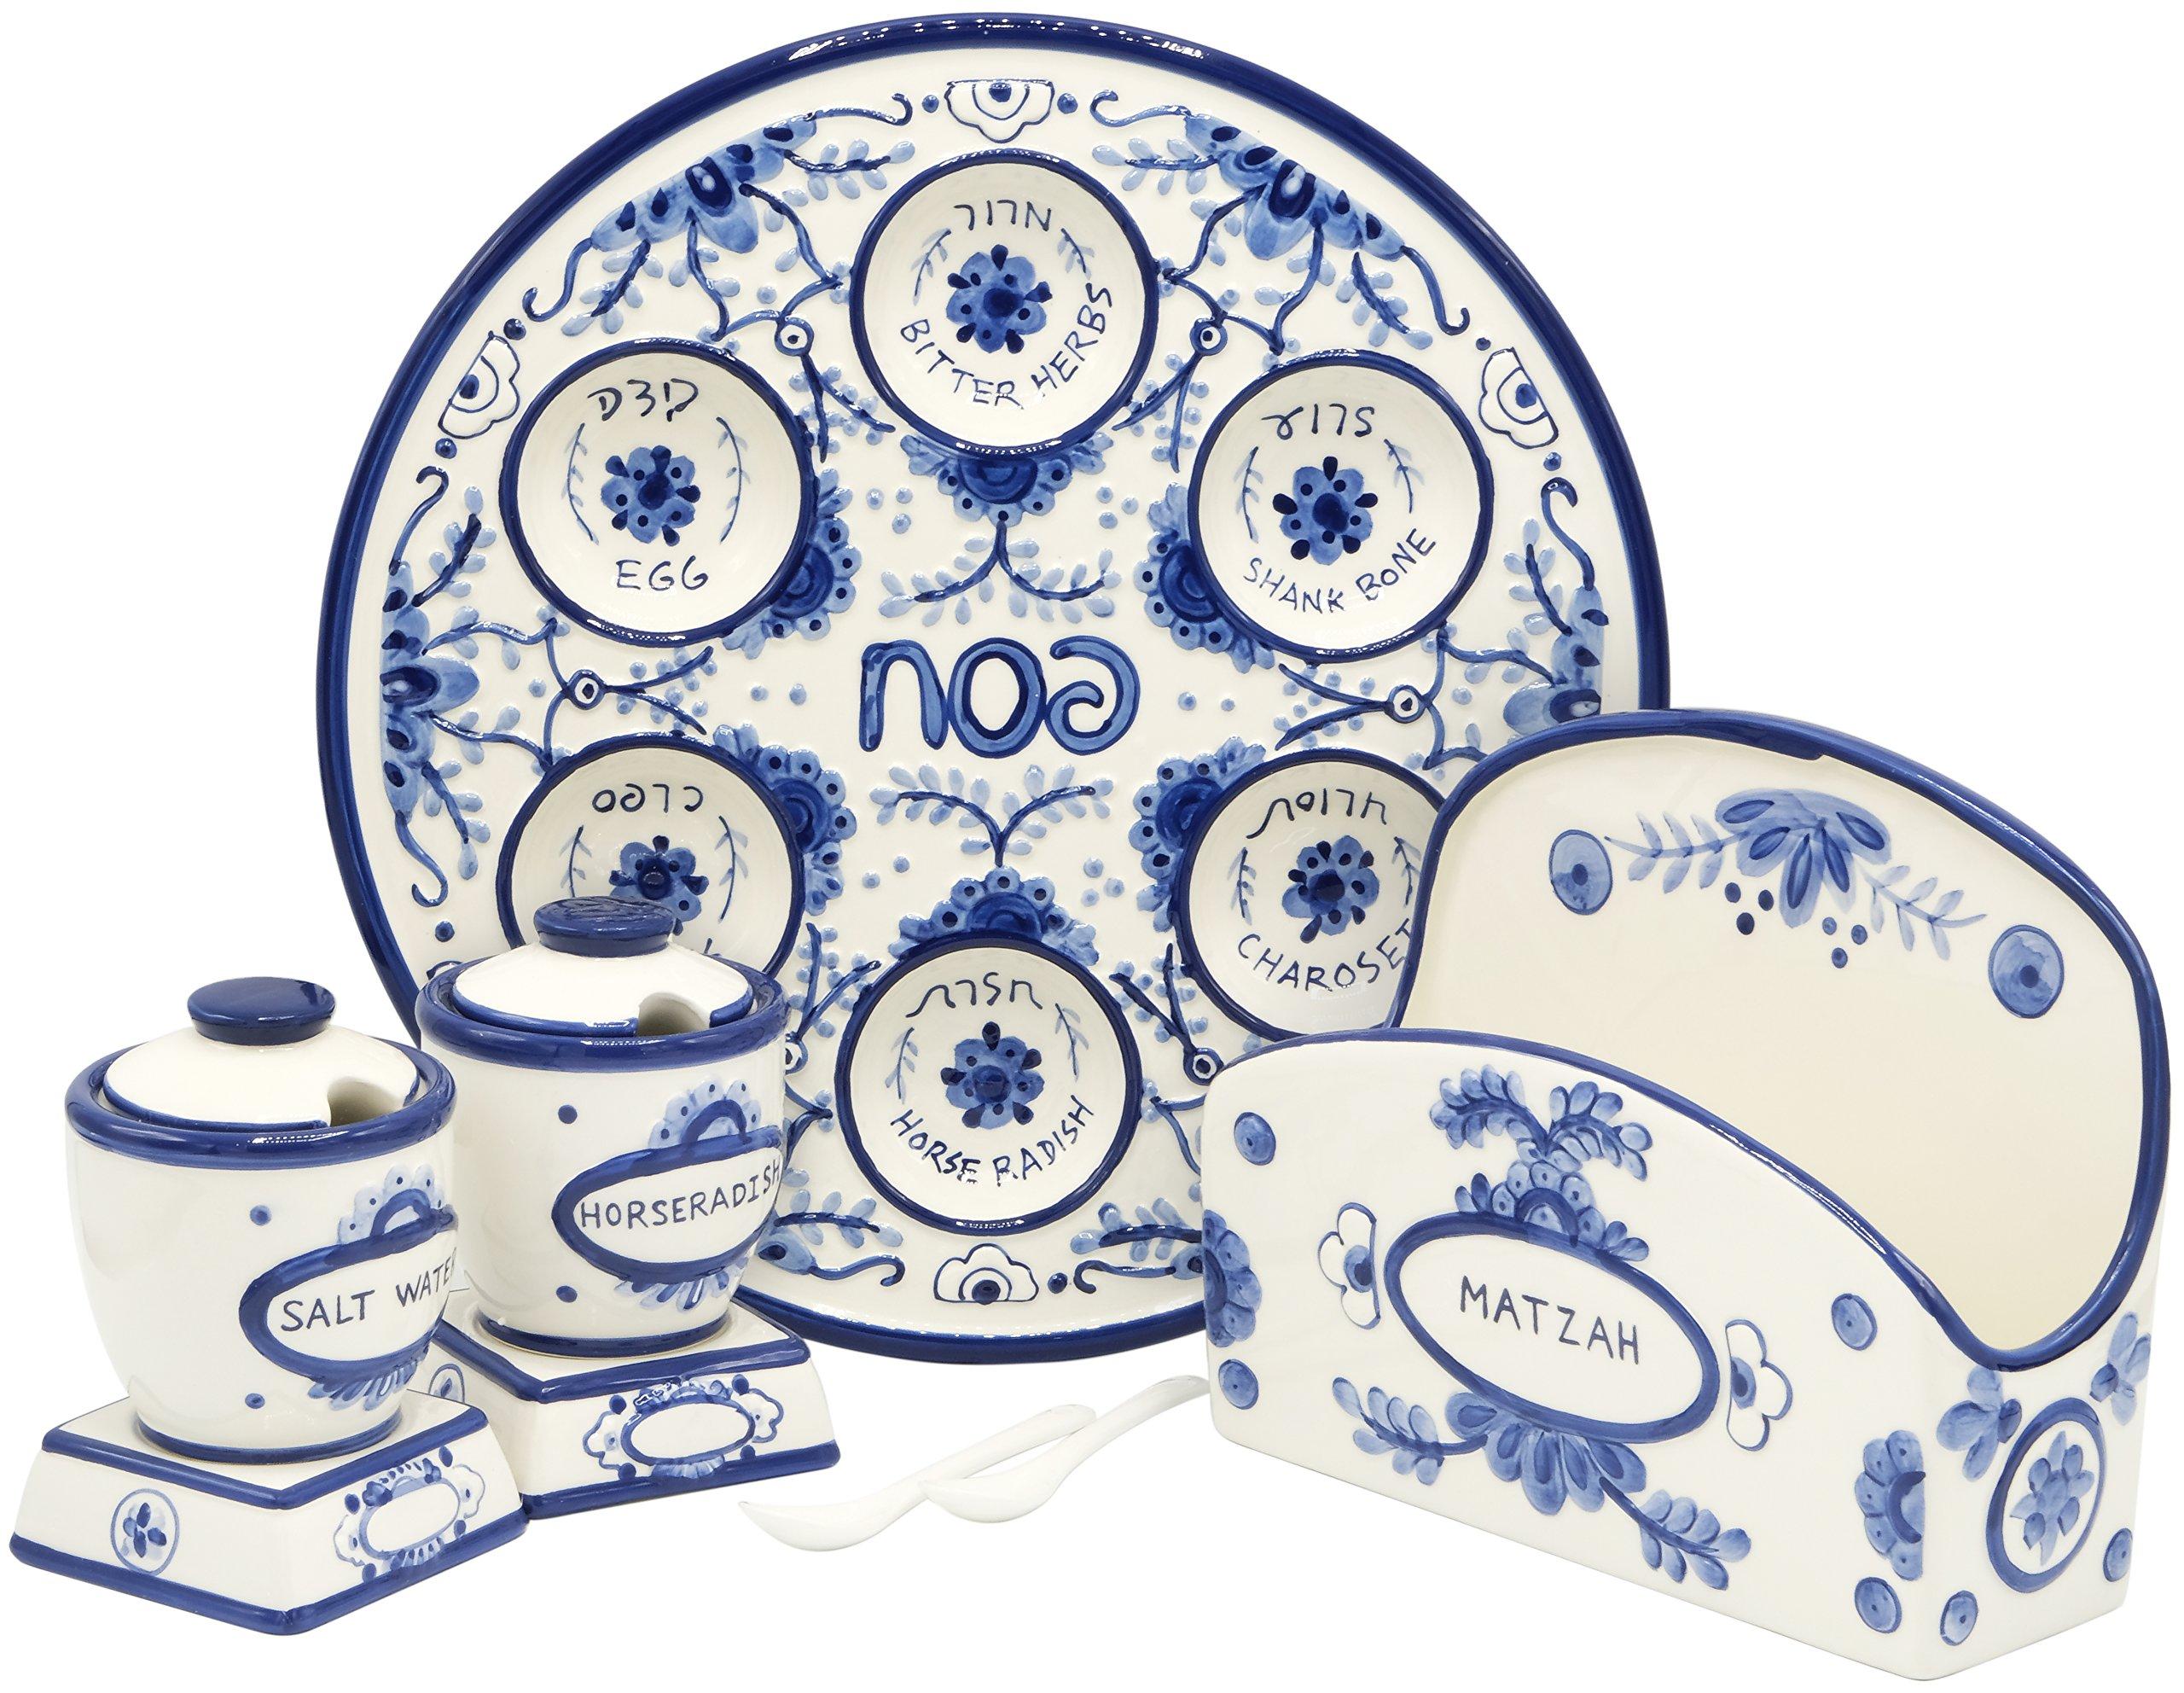 Passover Ceramic 12'' Blue & White Seder Plate, Matzah Holder, & Salt Water + Horseradish Set - Delft Design (Complete Passover Set)